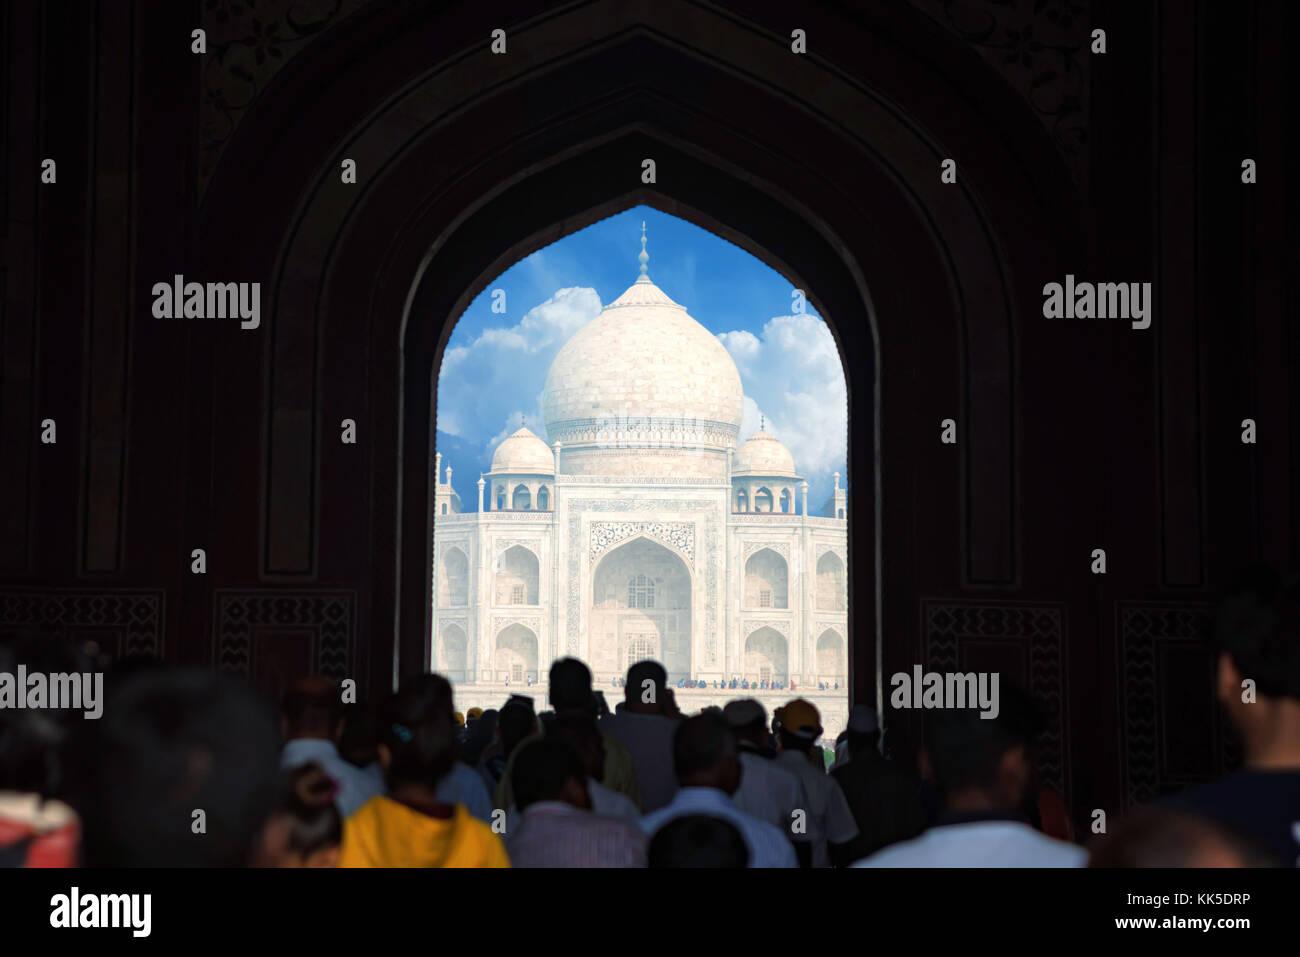 Taj Mahal malerische Tor Blick in Agra, Indien. Stockbild